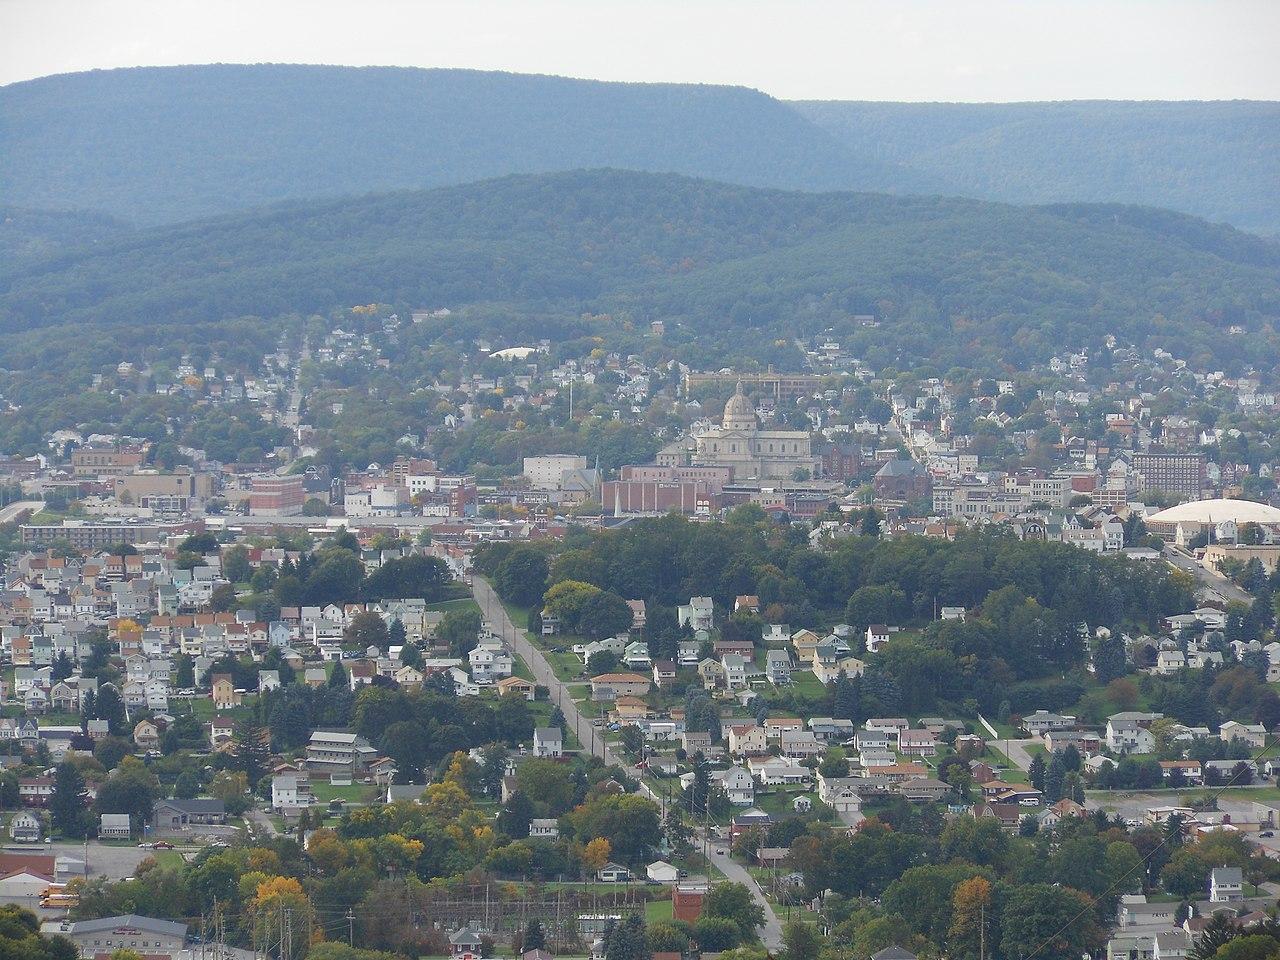 Altoona - Top-Rated Weekend Getaways to Explore in Pennsylvania